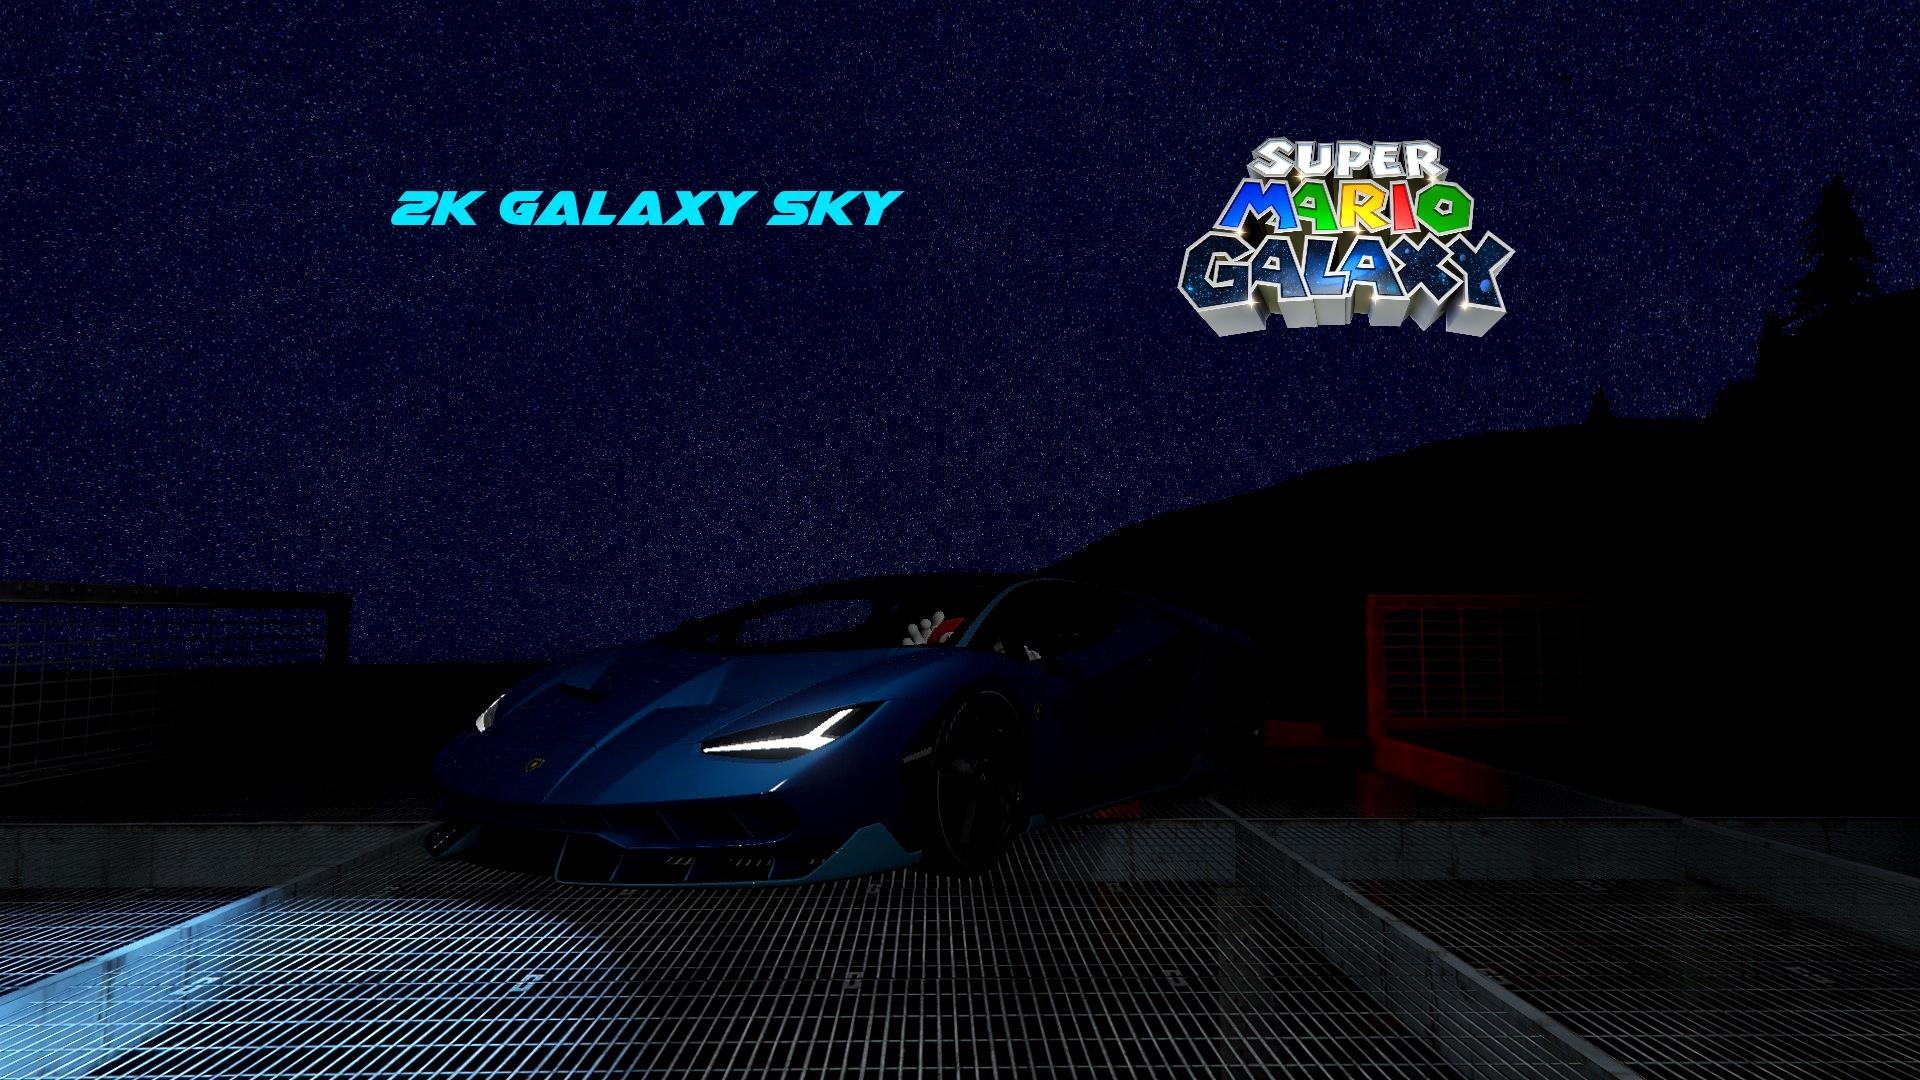 2k Galaxy Sky Smg2 Style Night Sky Enhanced Starfield